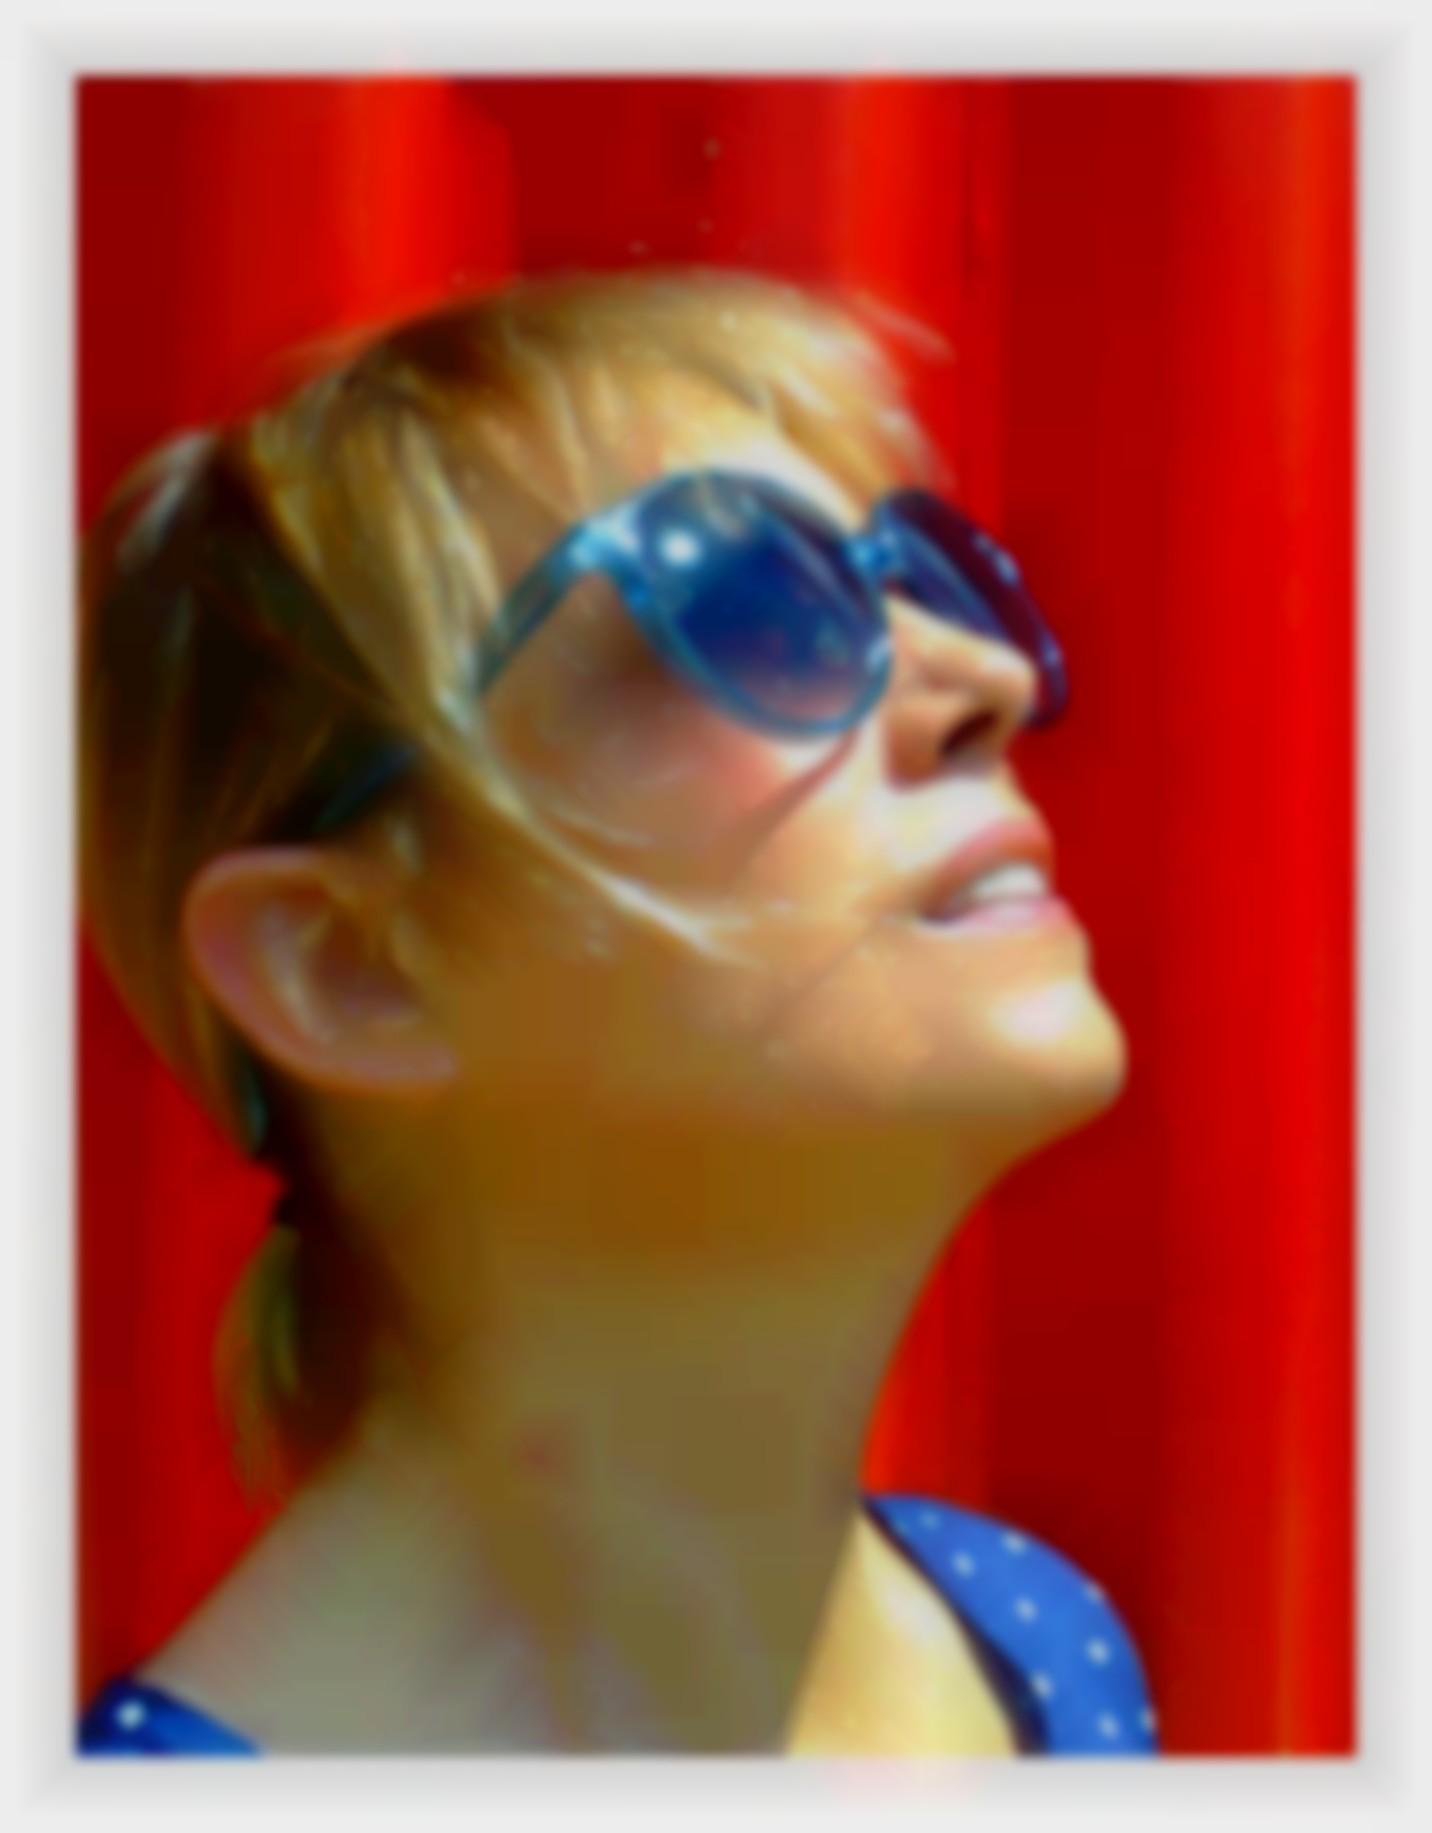 essays on nature in sanskrit Lomba essay 2009 essay in nature of sanskrit review of the literature research paper holocaust prejudice essay expose schreiben dissertation kocinski illustration essay.